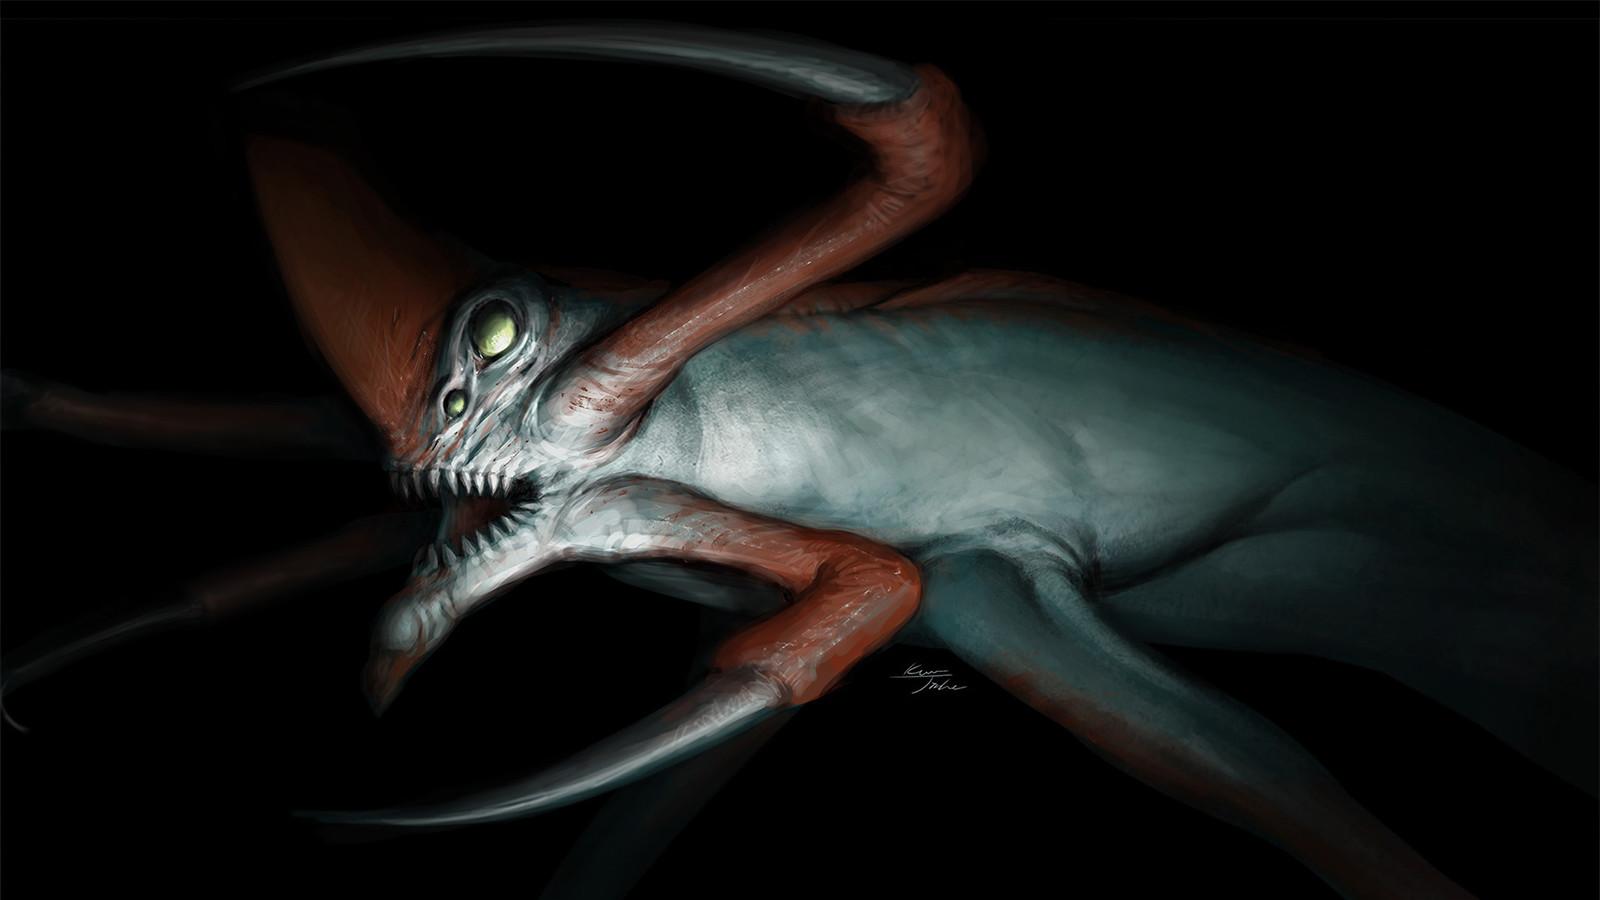 ArtStation - Fan art - Reaper Leviathan (Subnautica), Jinha Kwon